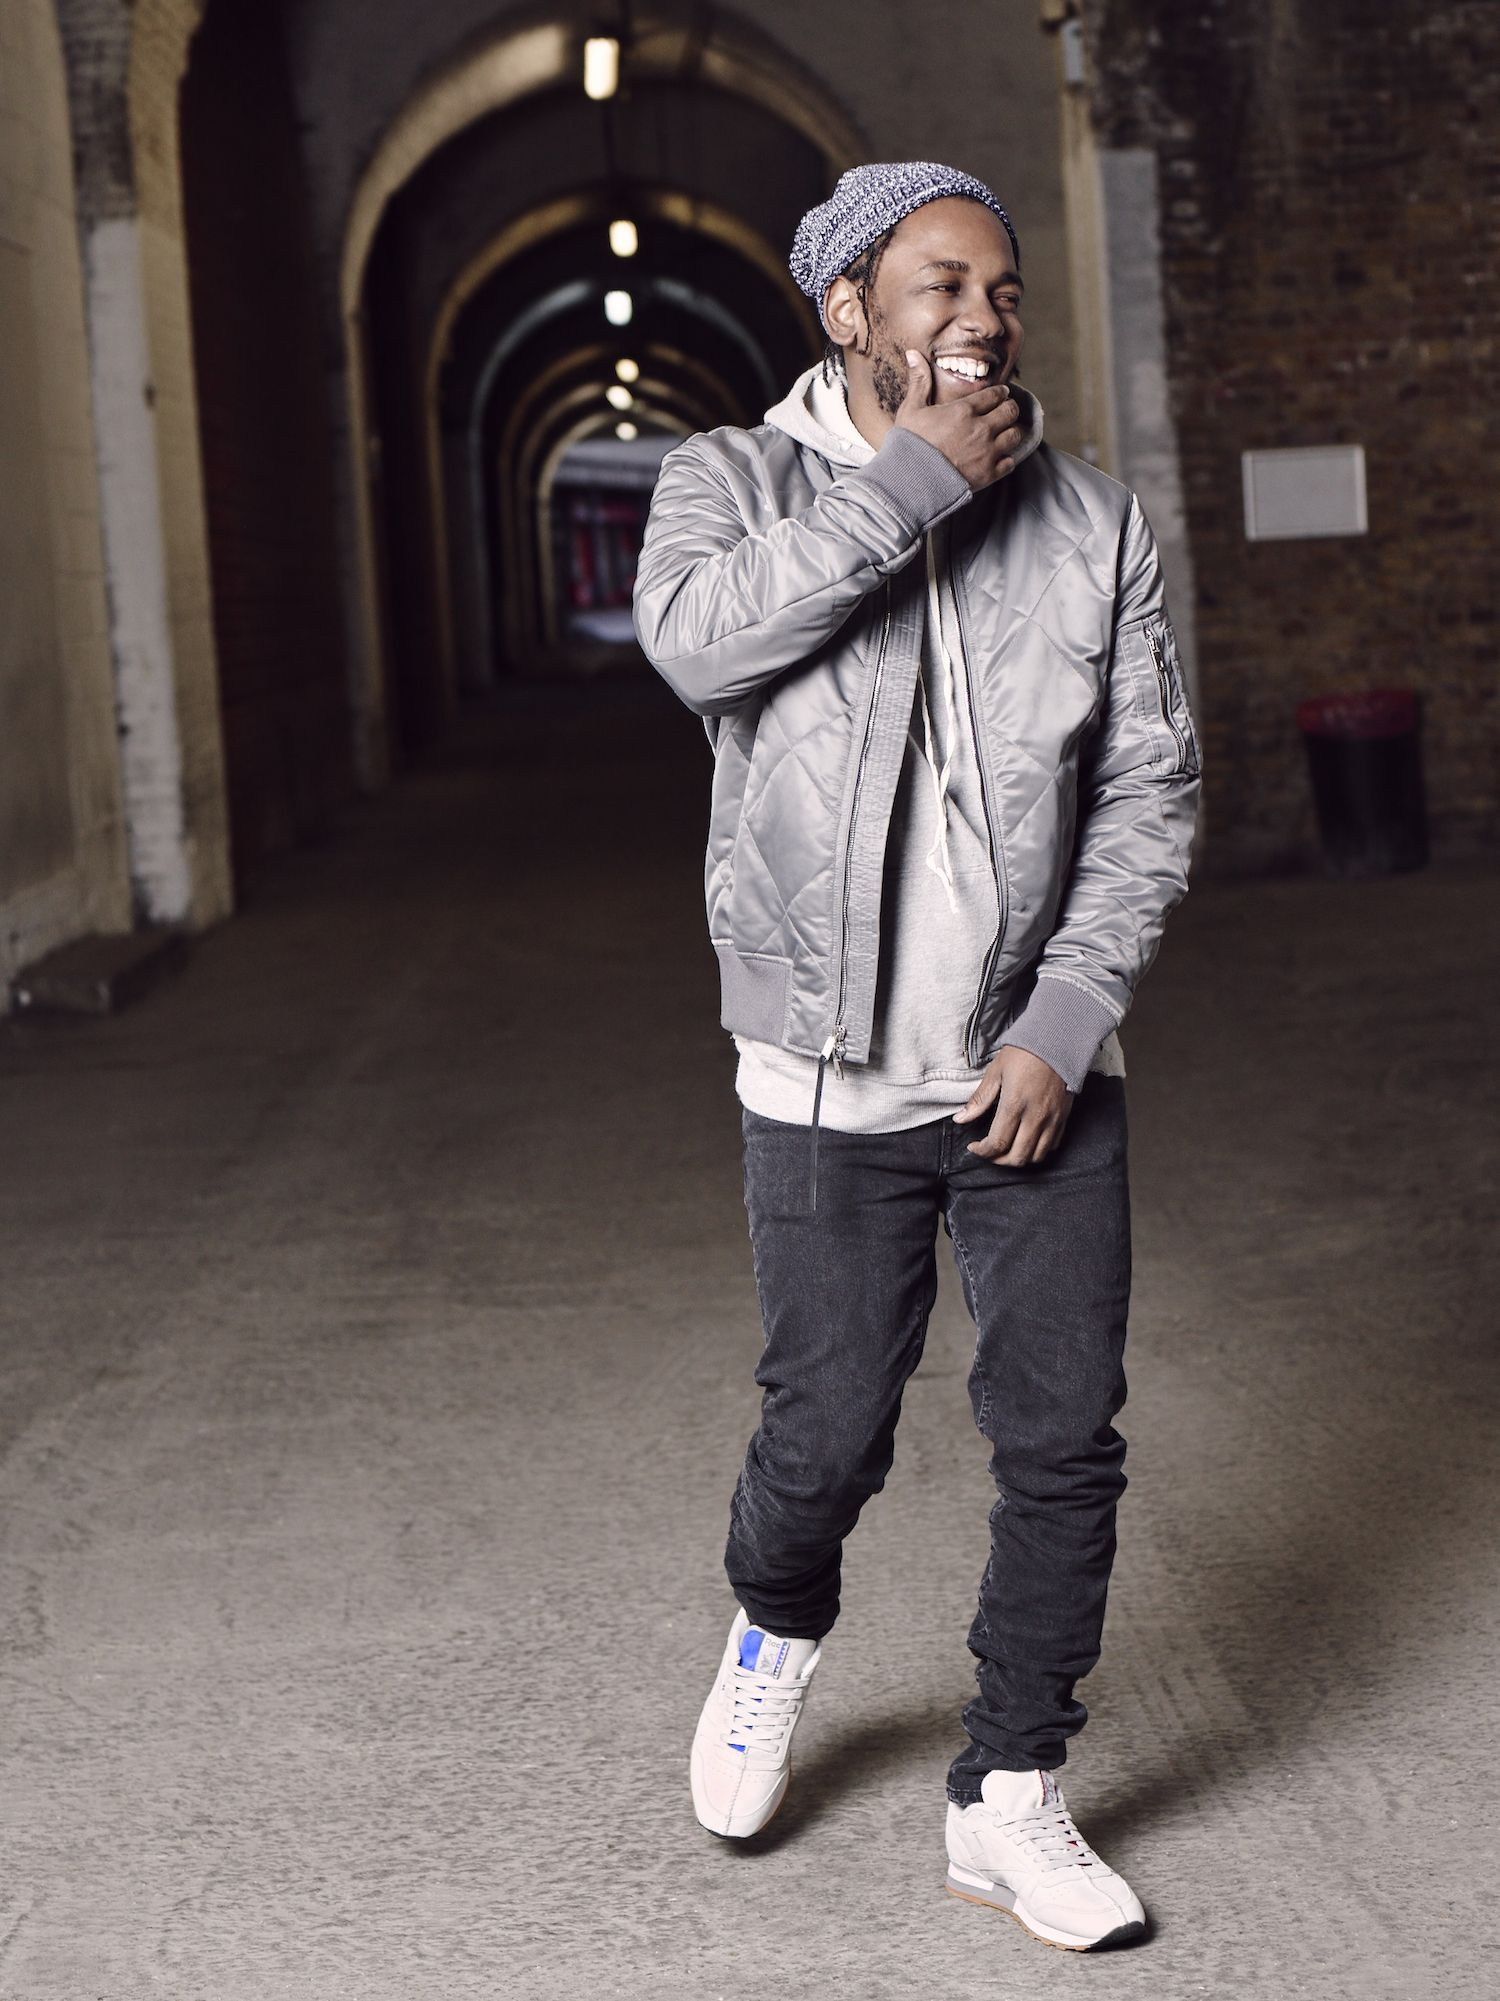 b9aac527 Releasing: Kendrick Lamar x Reebok Classic Leather Deconstructed - EU  Kicks: Sneaker Magazine